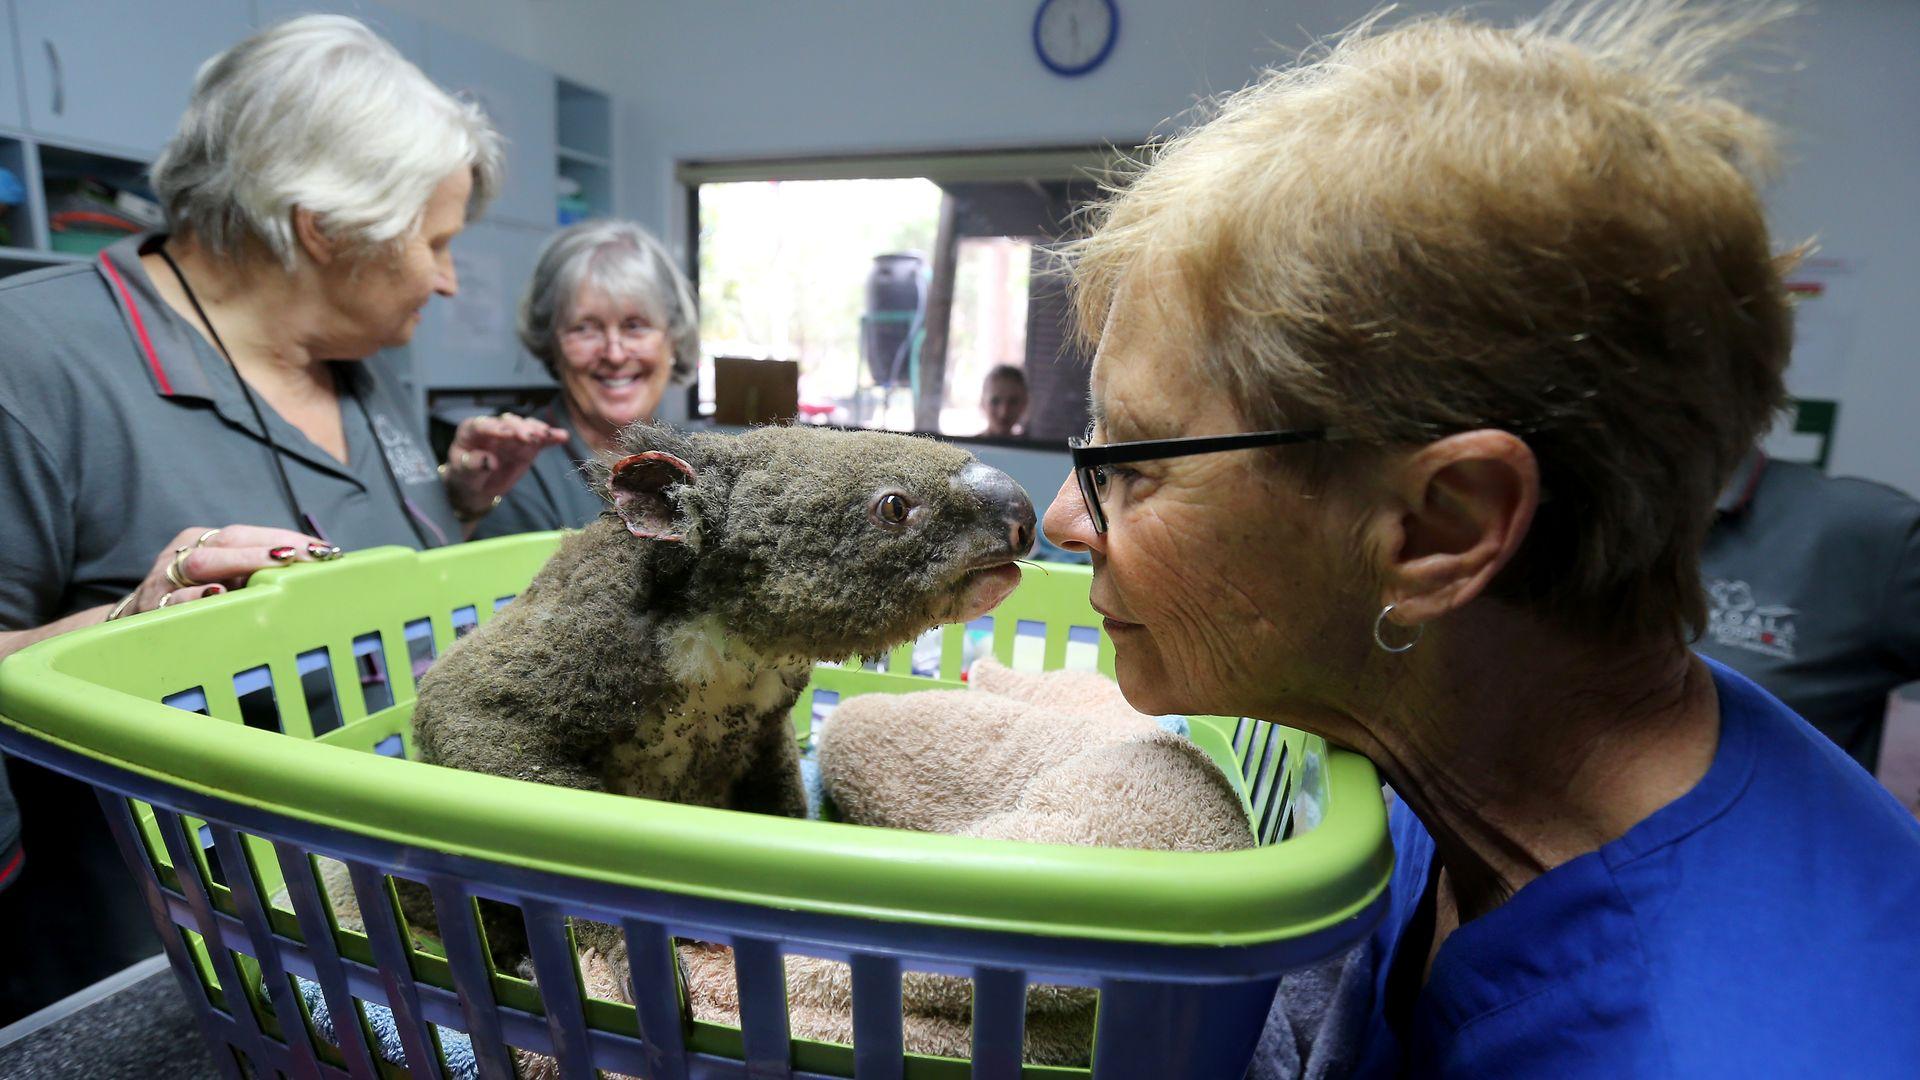 Alma Concepcion Hot australia bushfires: devastating impact on koalas - axios